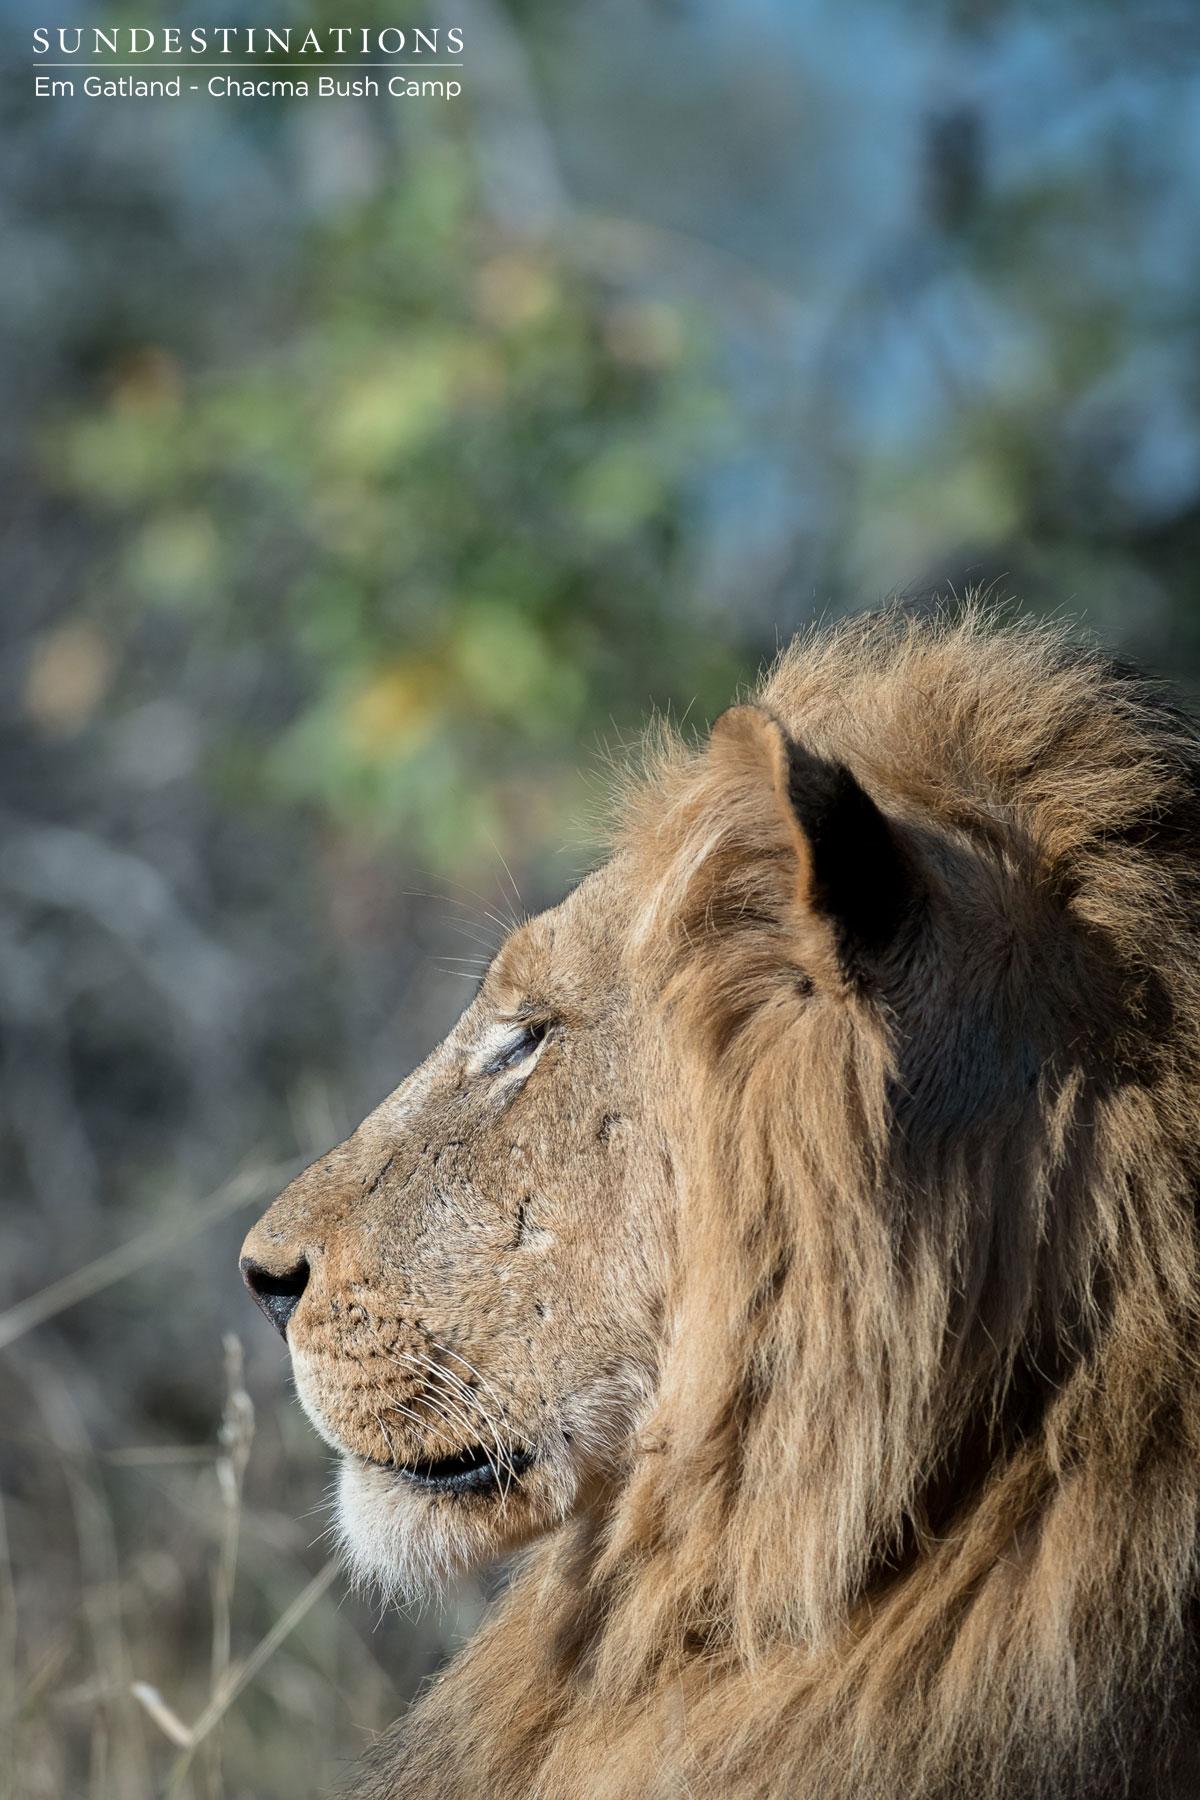 Chacma Male Lion Mane